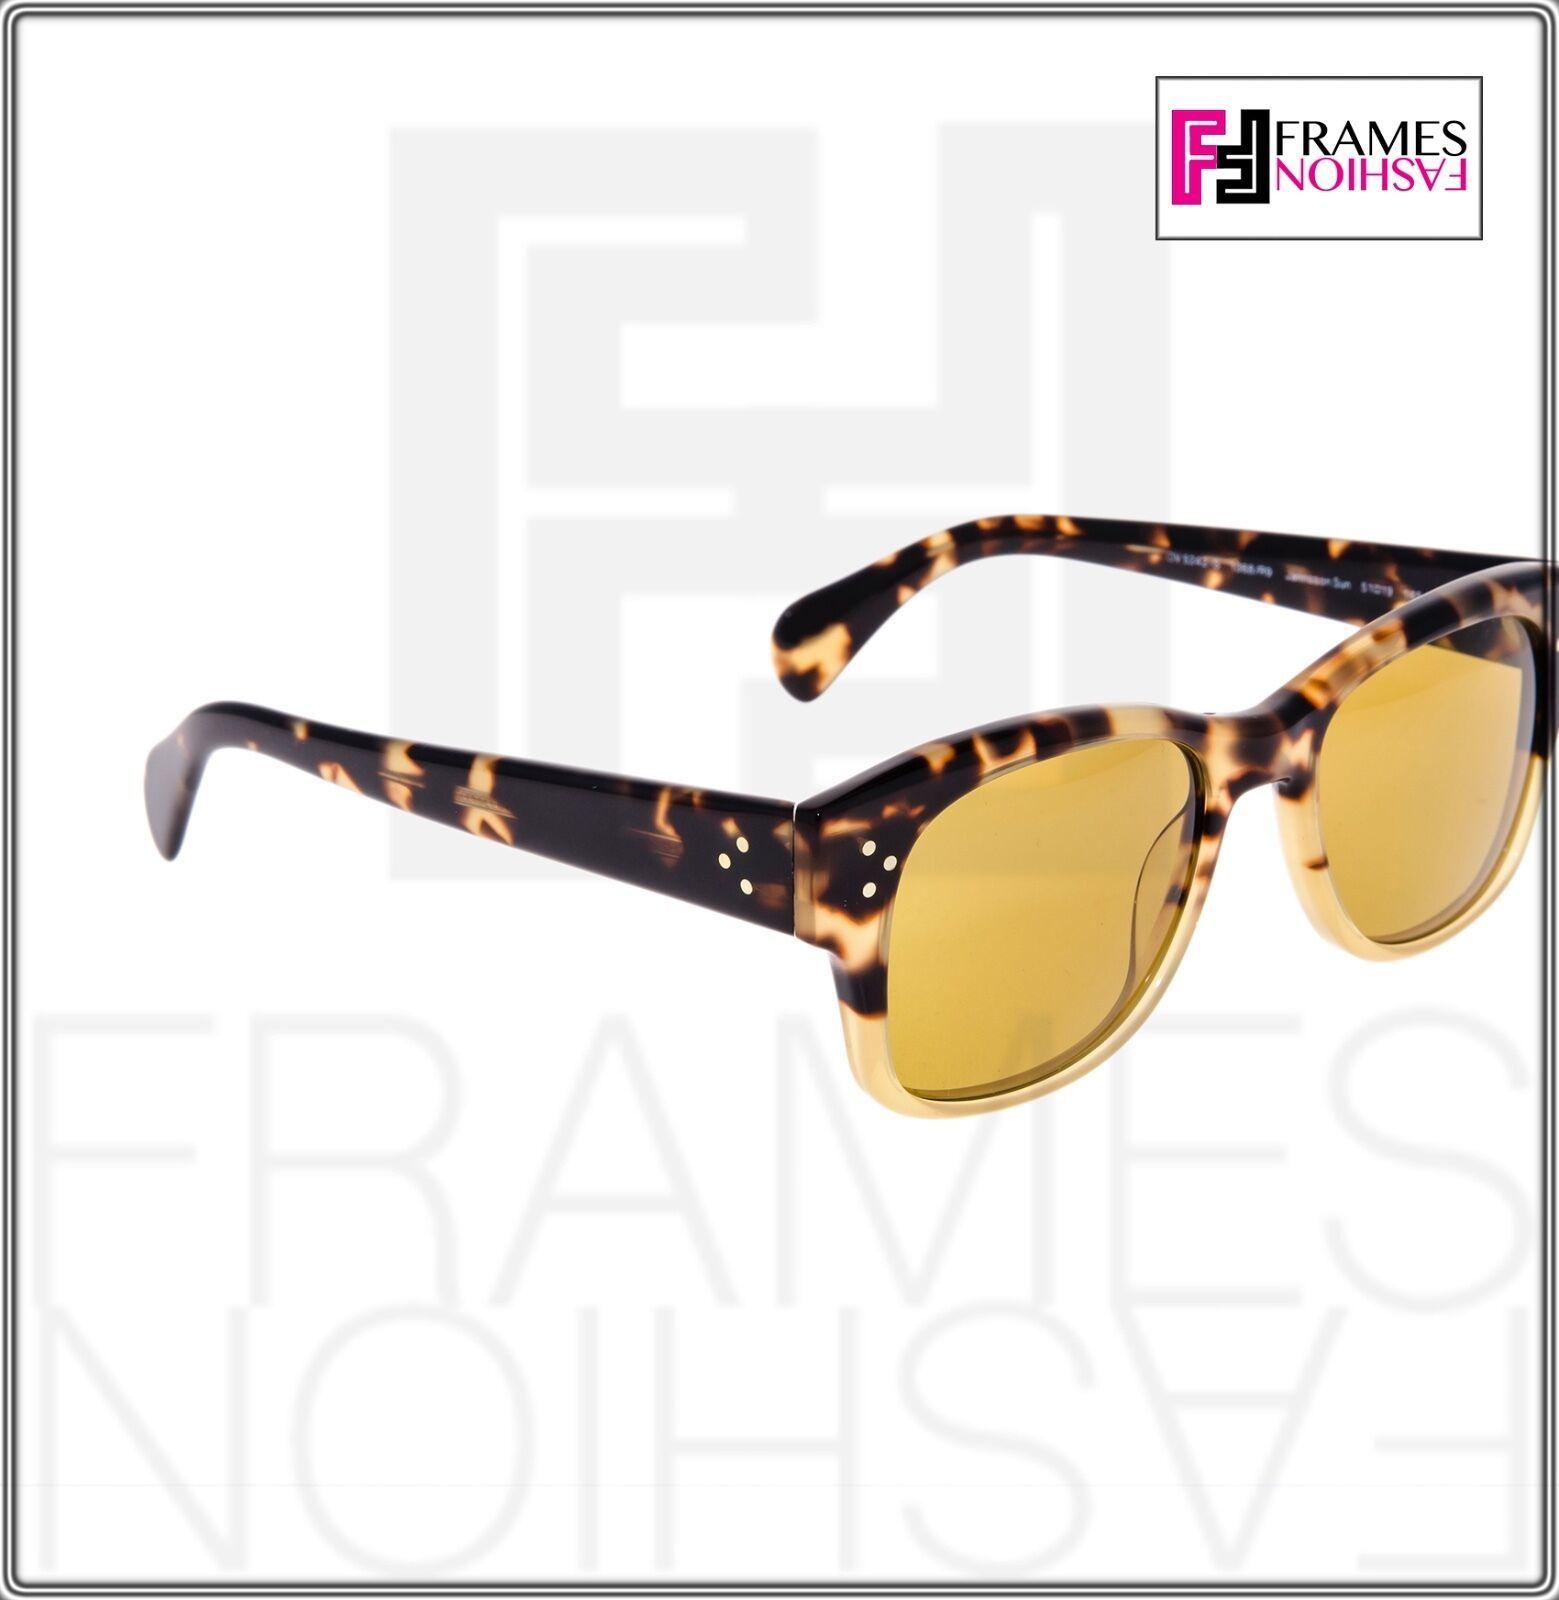 OLIVER PEOPLES Jannsson Sun OV5242S Honey Brown VFX Photochromic Sunglasses 5242 image 5